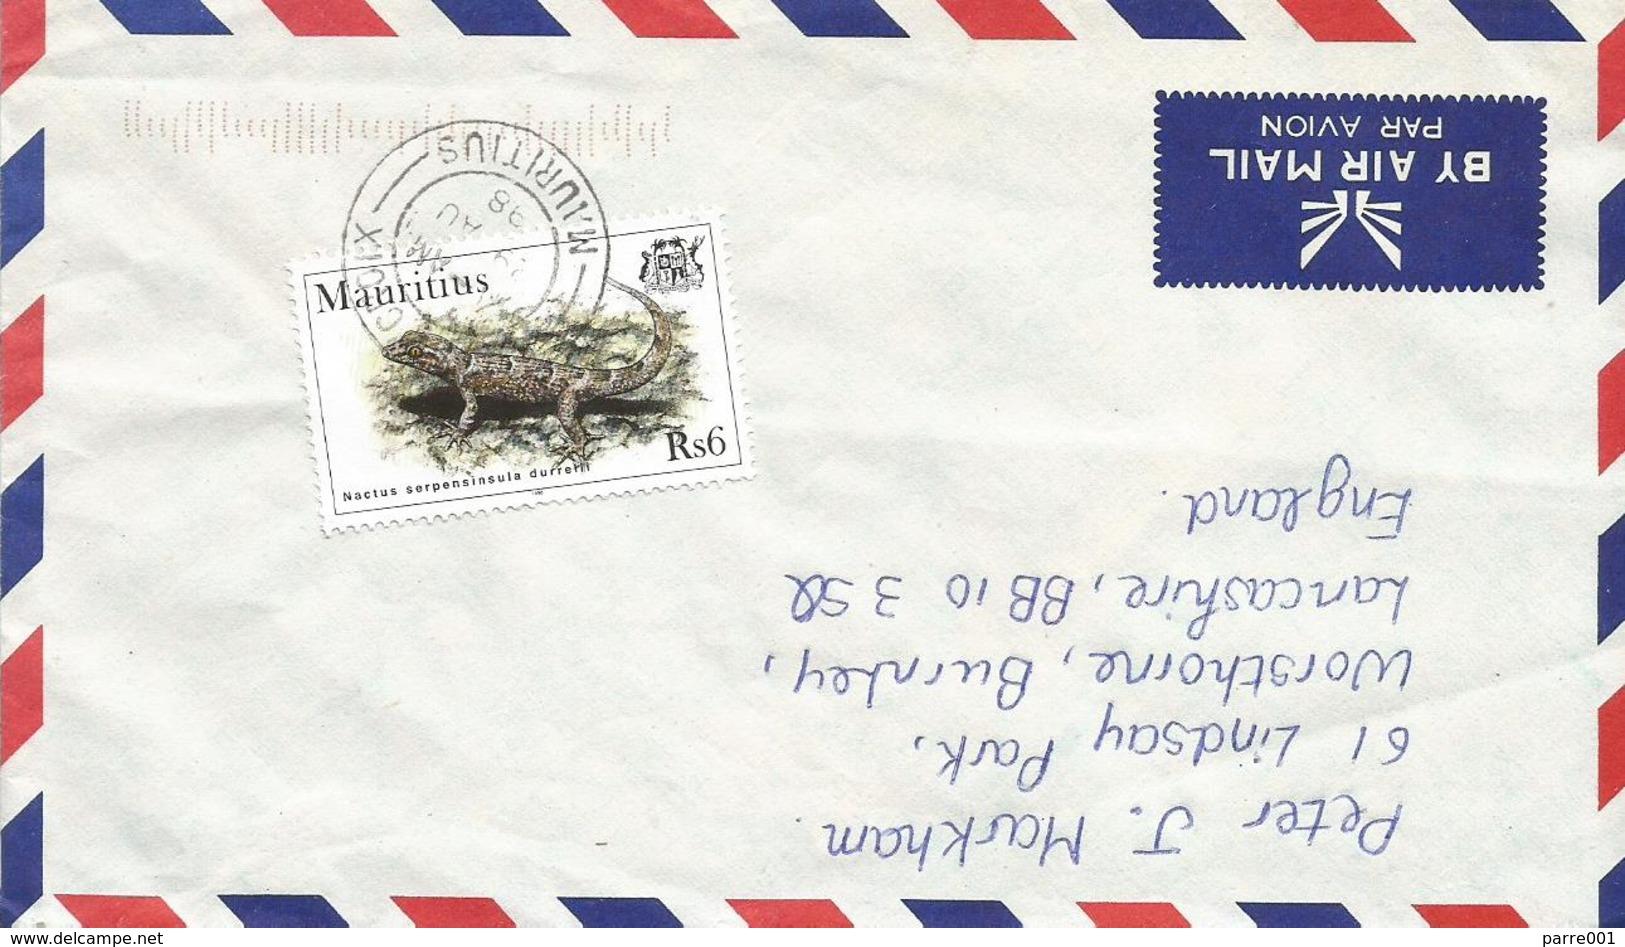 Mauritius 1998 Croix Lizard Nactus Serpensinsula Cover - Mauritius (1968-...)